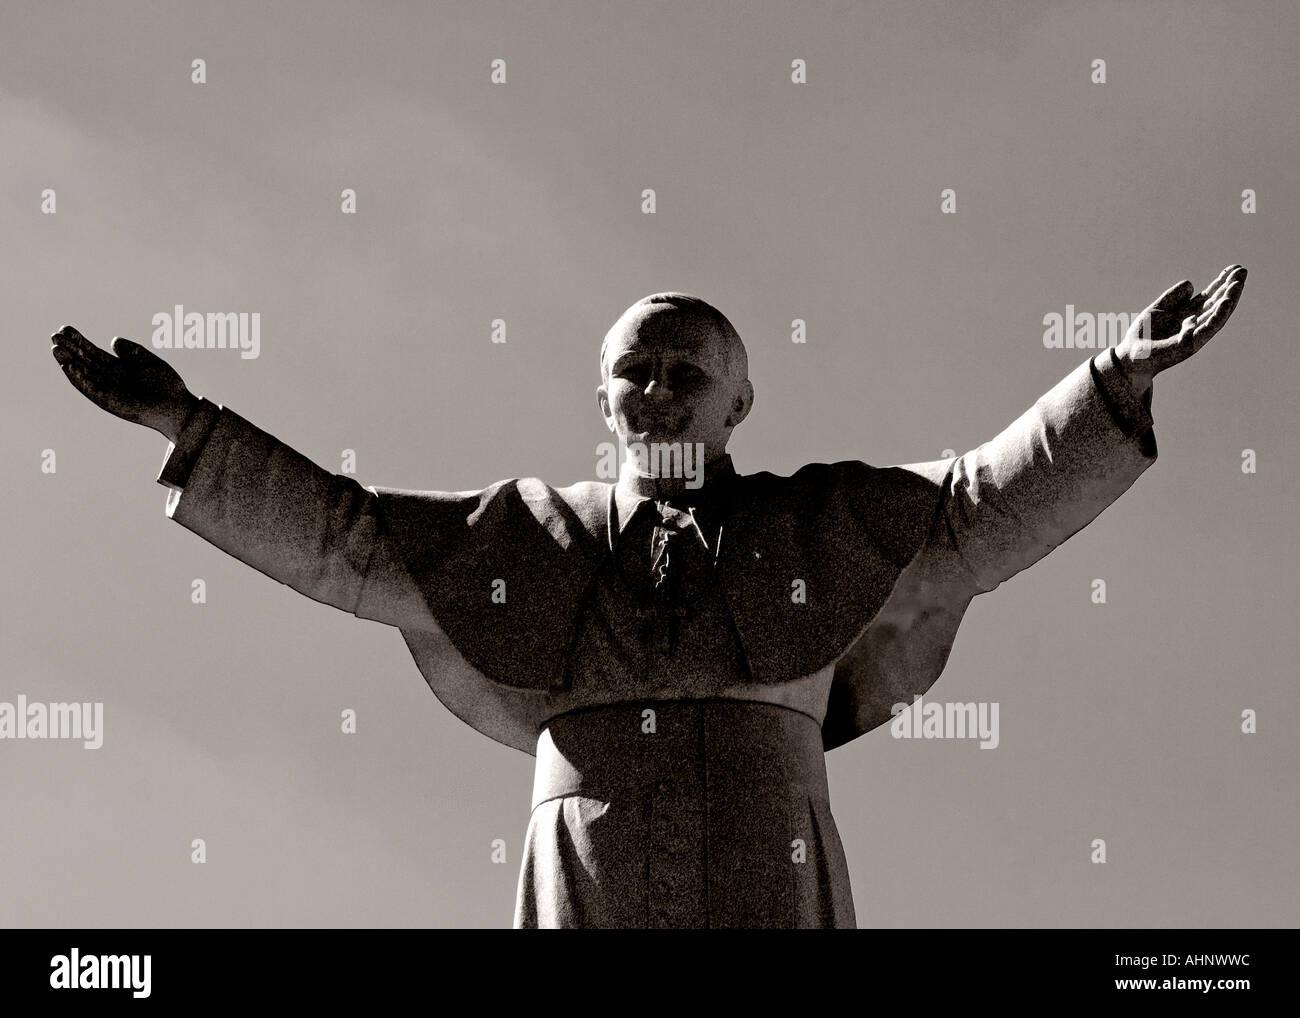 Le Pape Jean Paul II Statue en monochrome Photo Stock